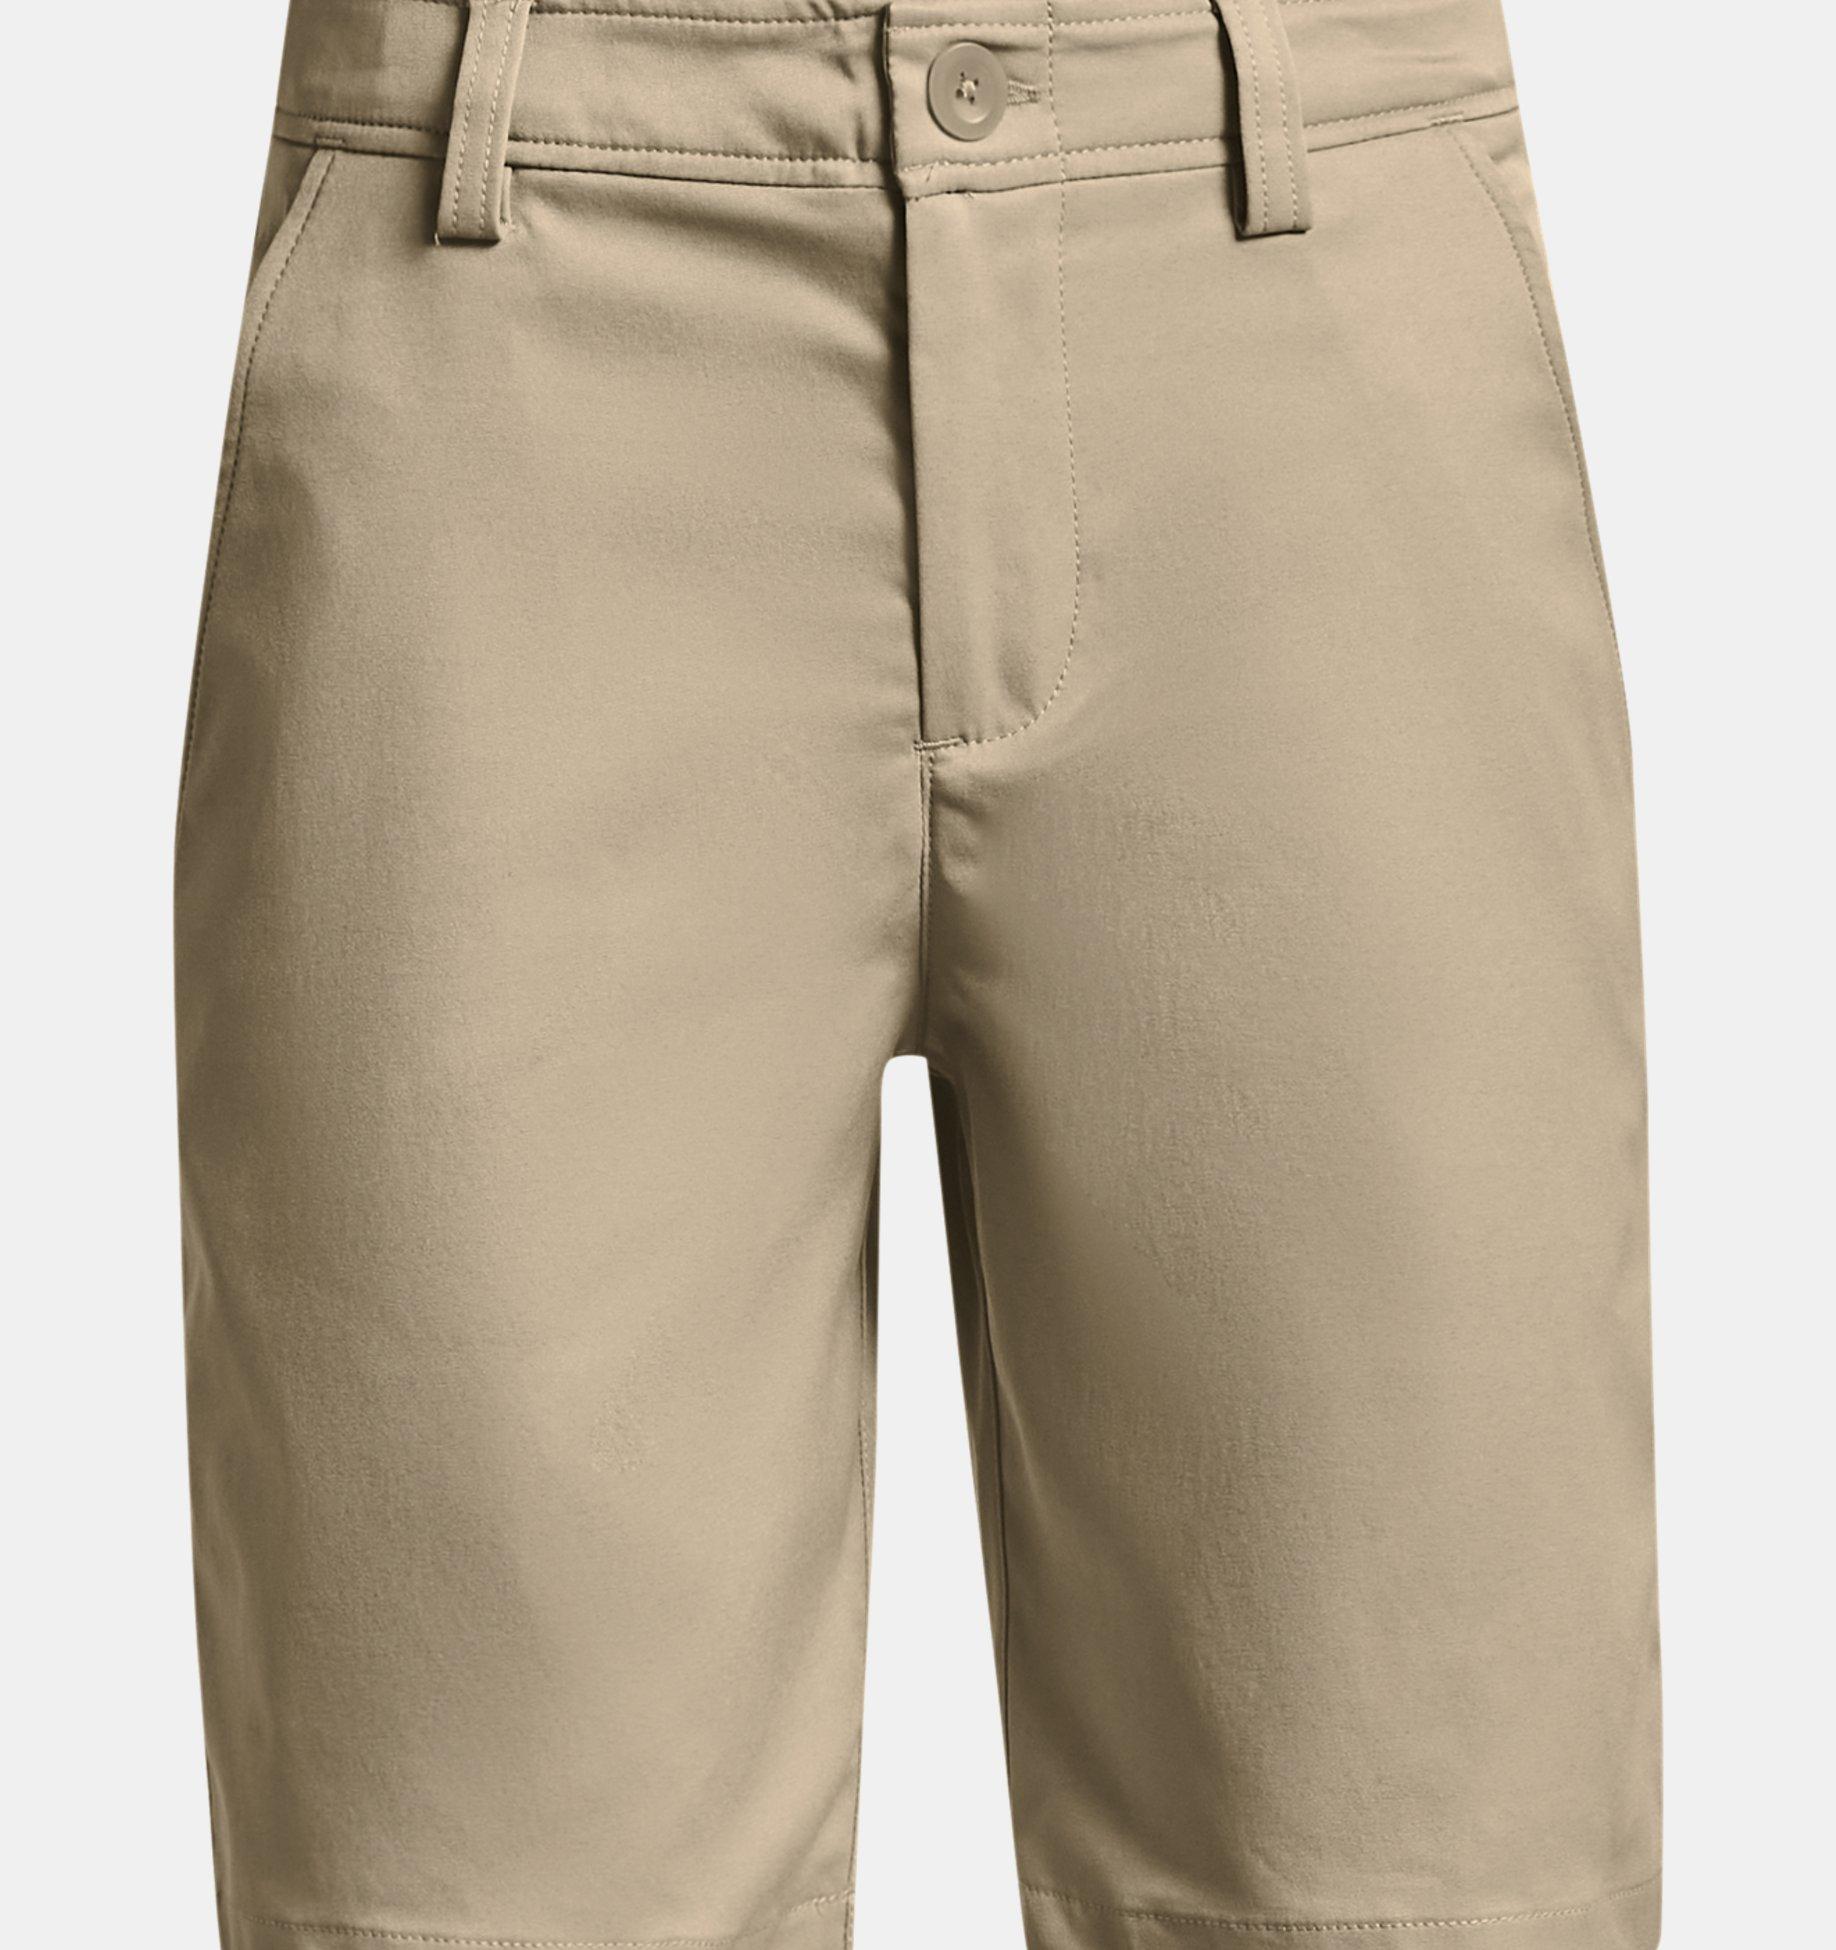 Underarmour Boys UA Match Play Shorts